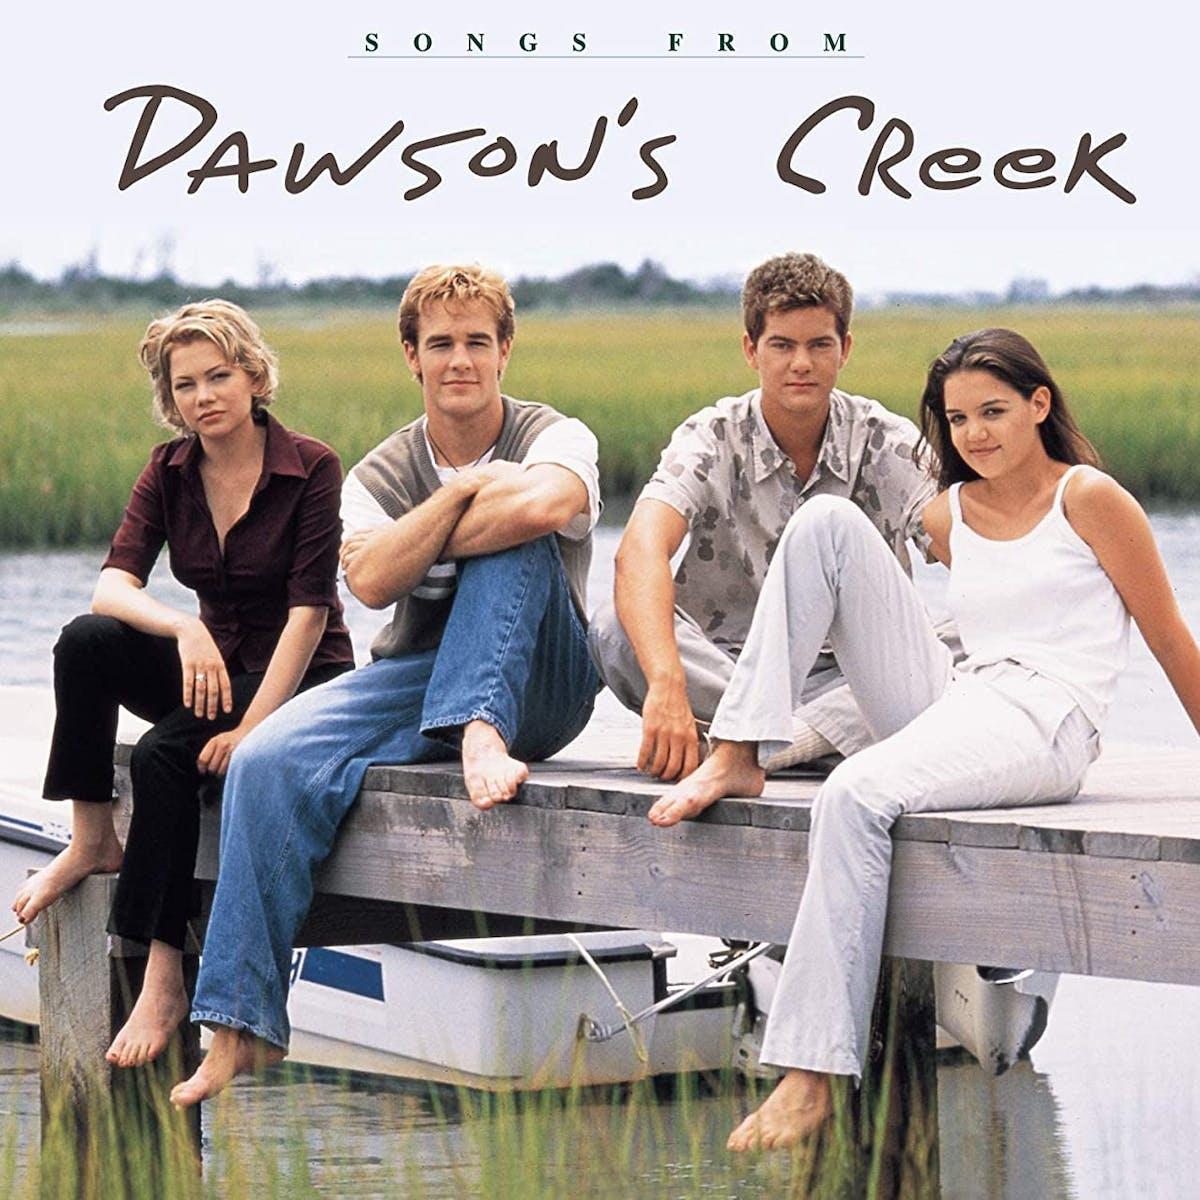 Image result for dawsons creek